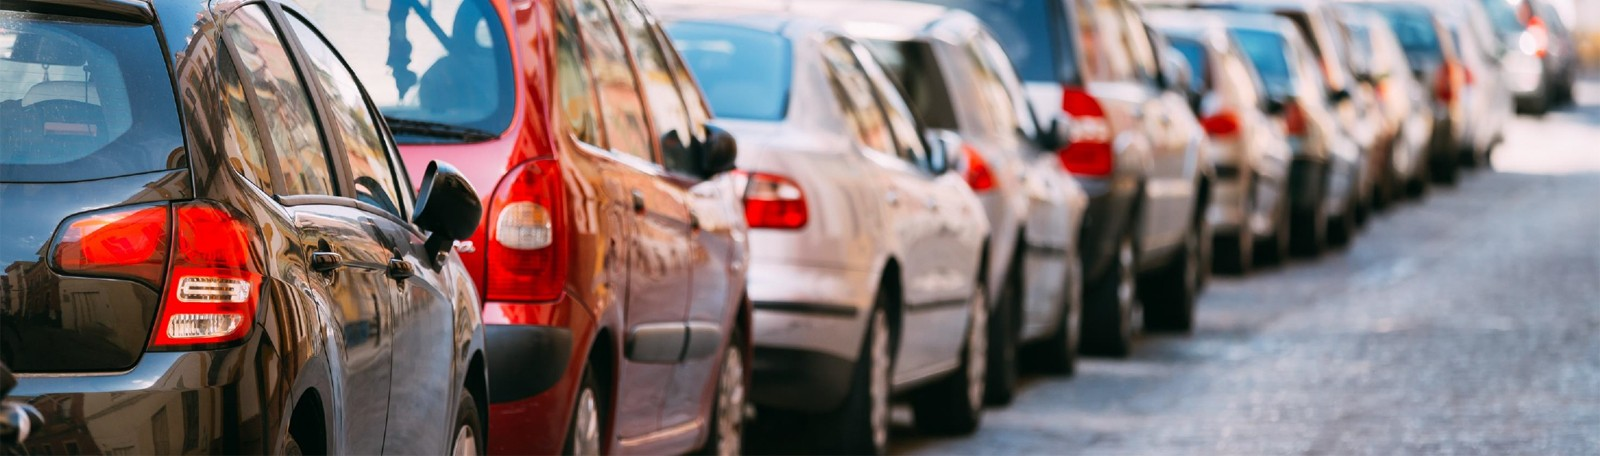 Parkeer op straat met Q-Park - Q-Park Résa: reserveer uw parking met enkele klikken!